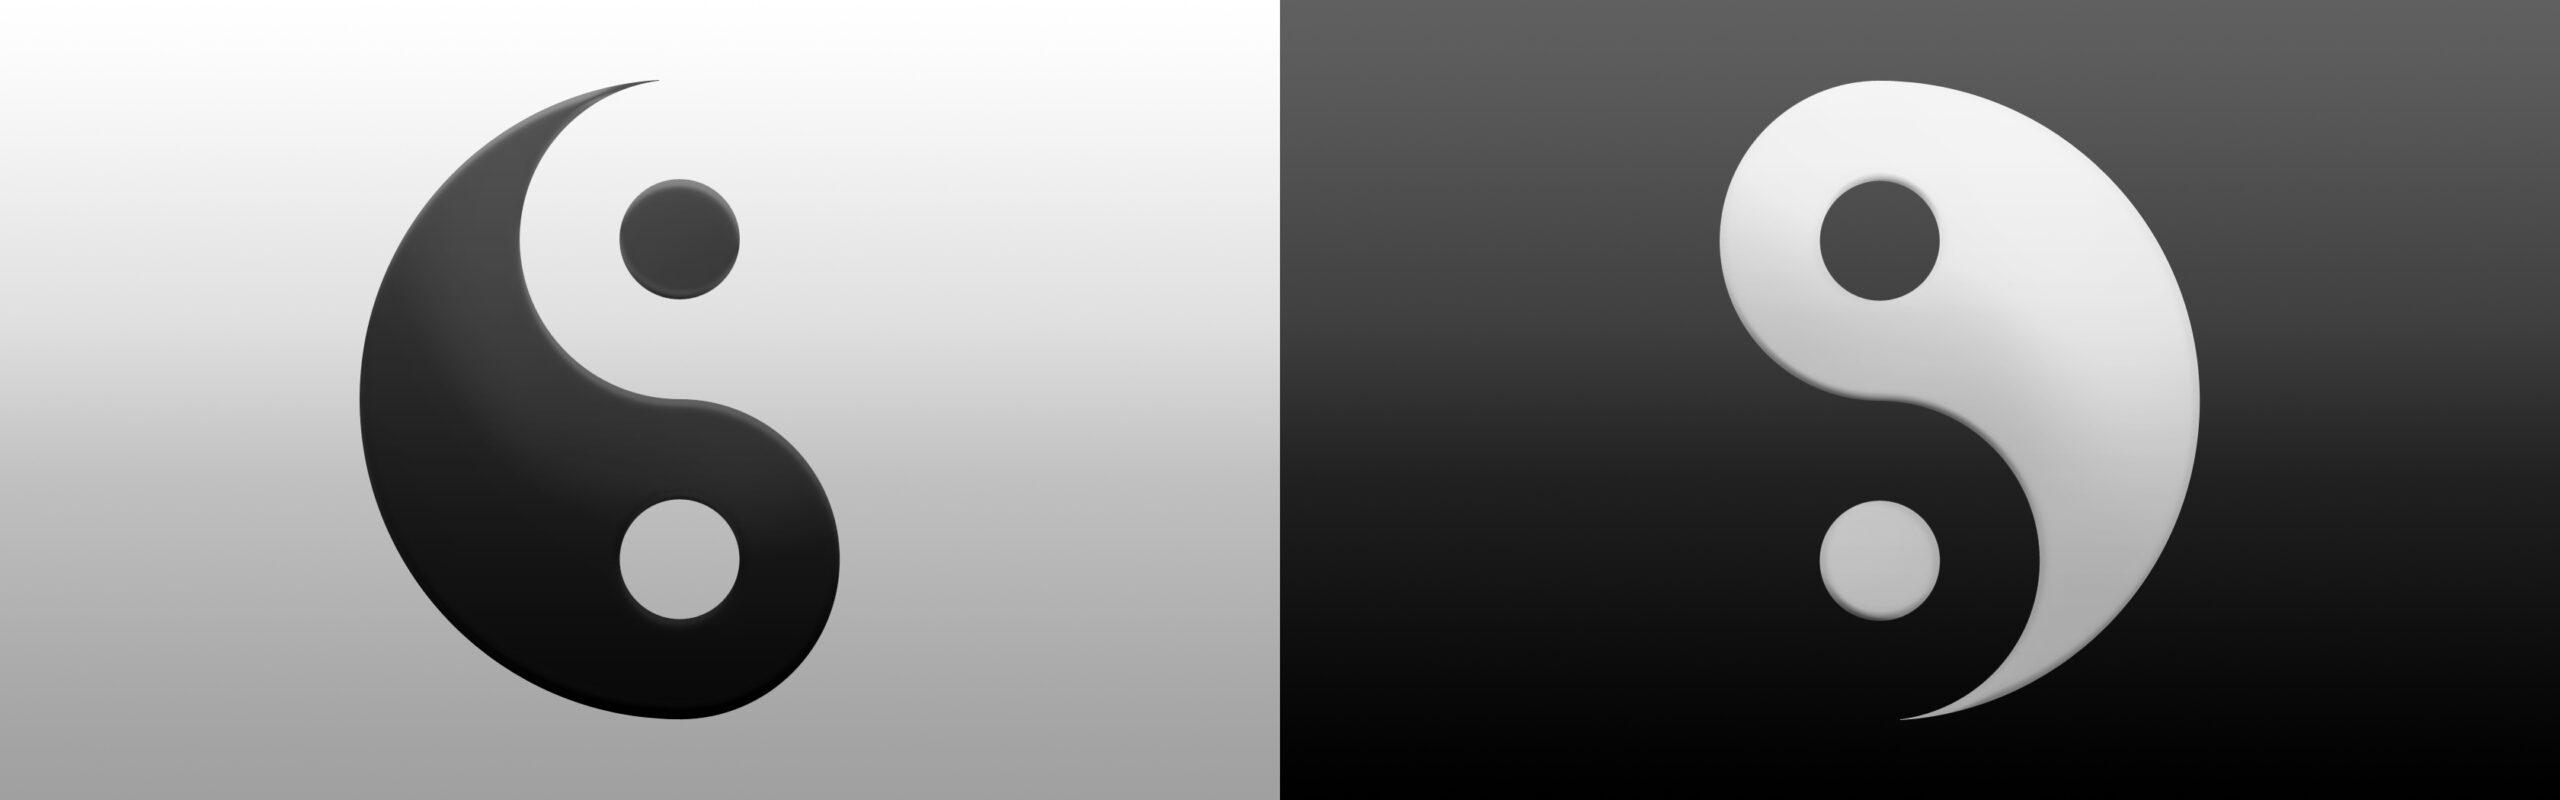 http://server.digimetriq.com/wp-content/uploads/2020/12/1609419454_510_50-HD-Dual-Monitor-Wallpaper-For-PC-2021.jpg